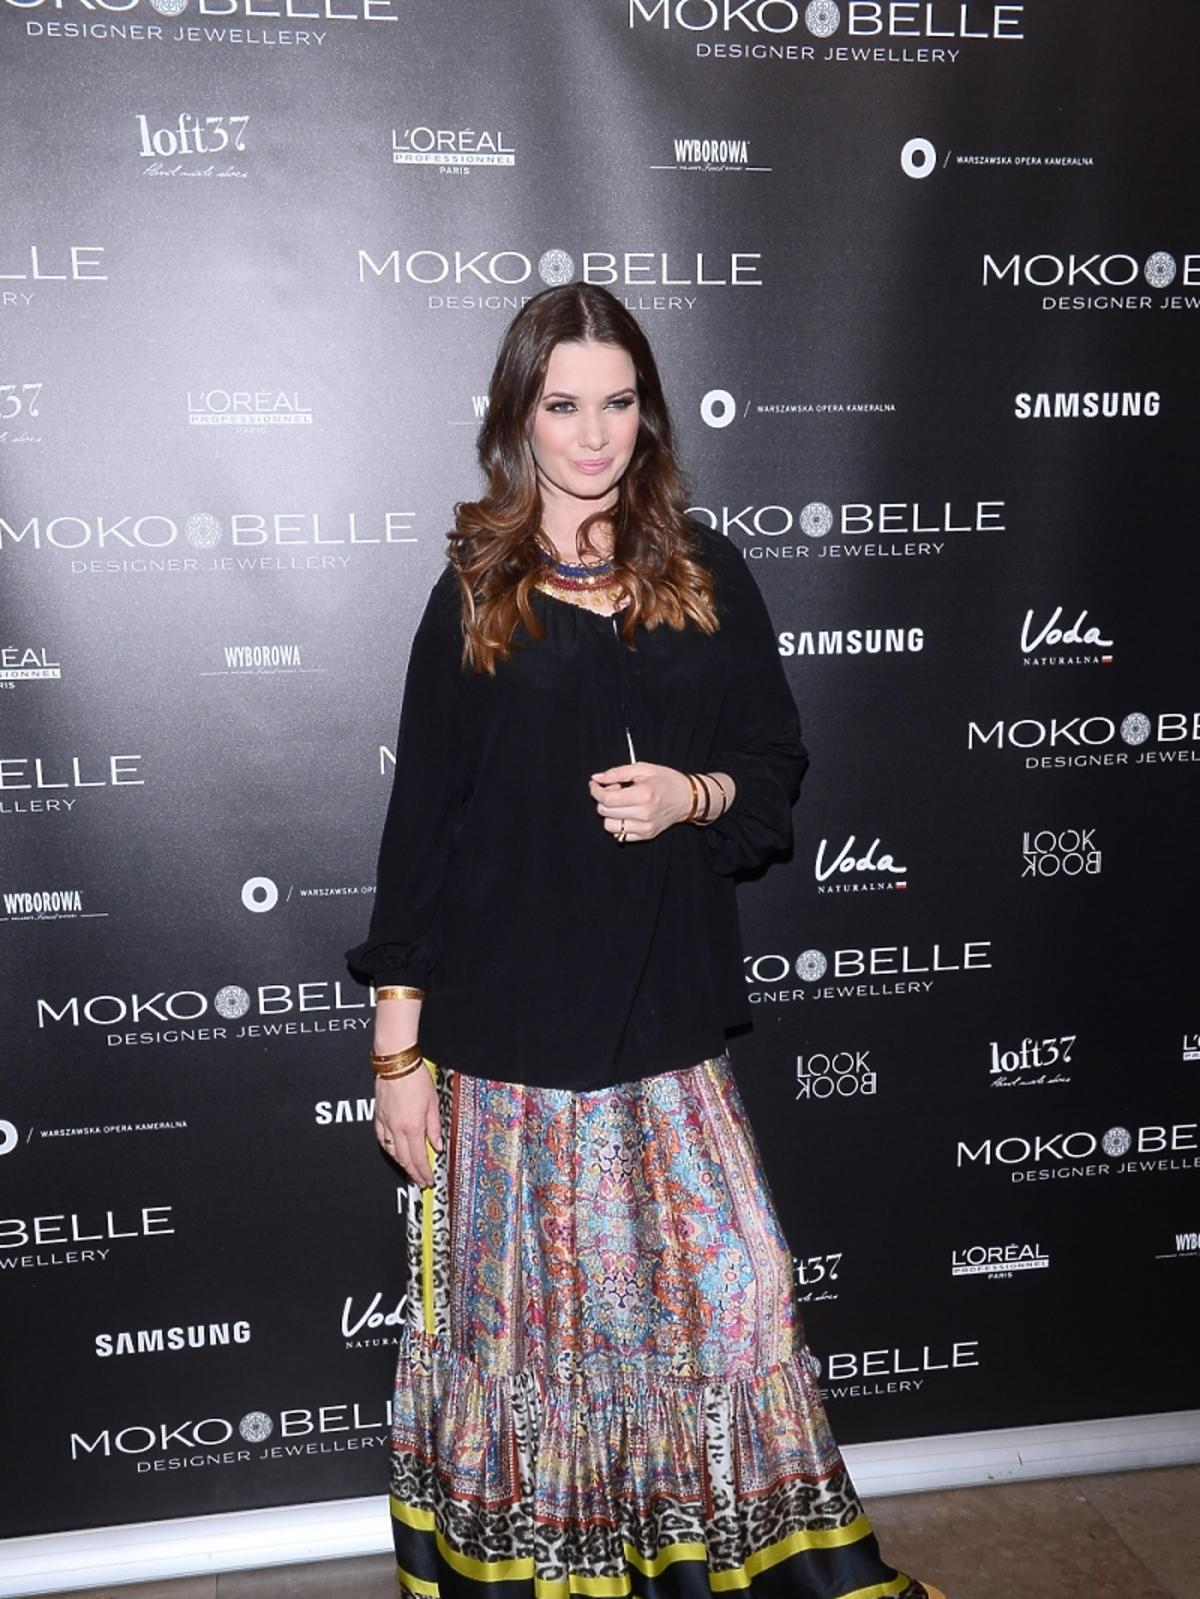 Karolina Malinowska na pokazie Mokobelle